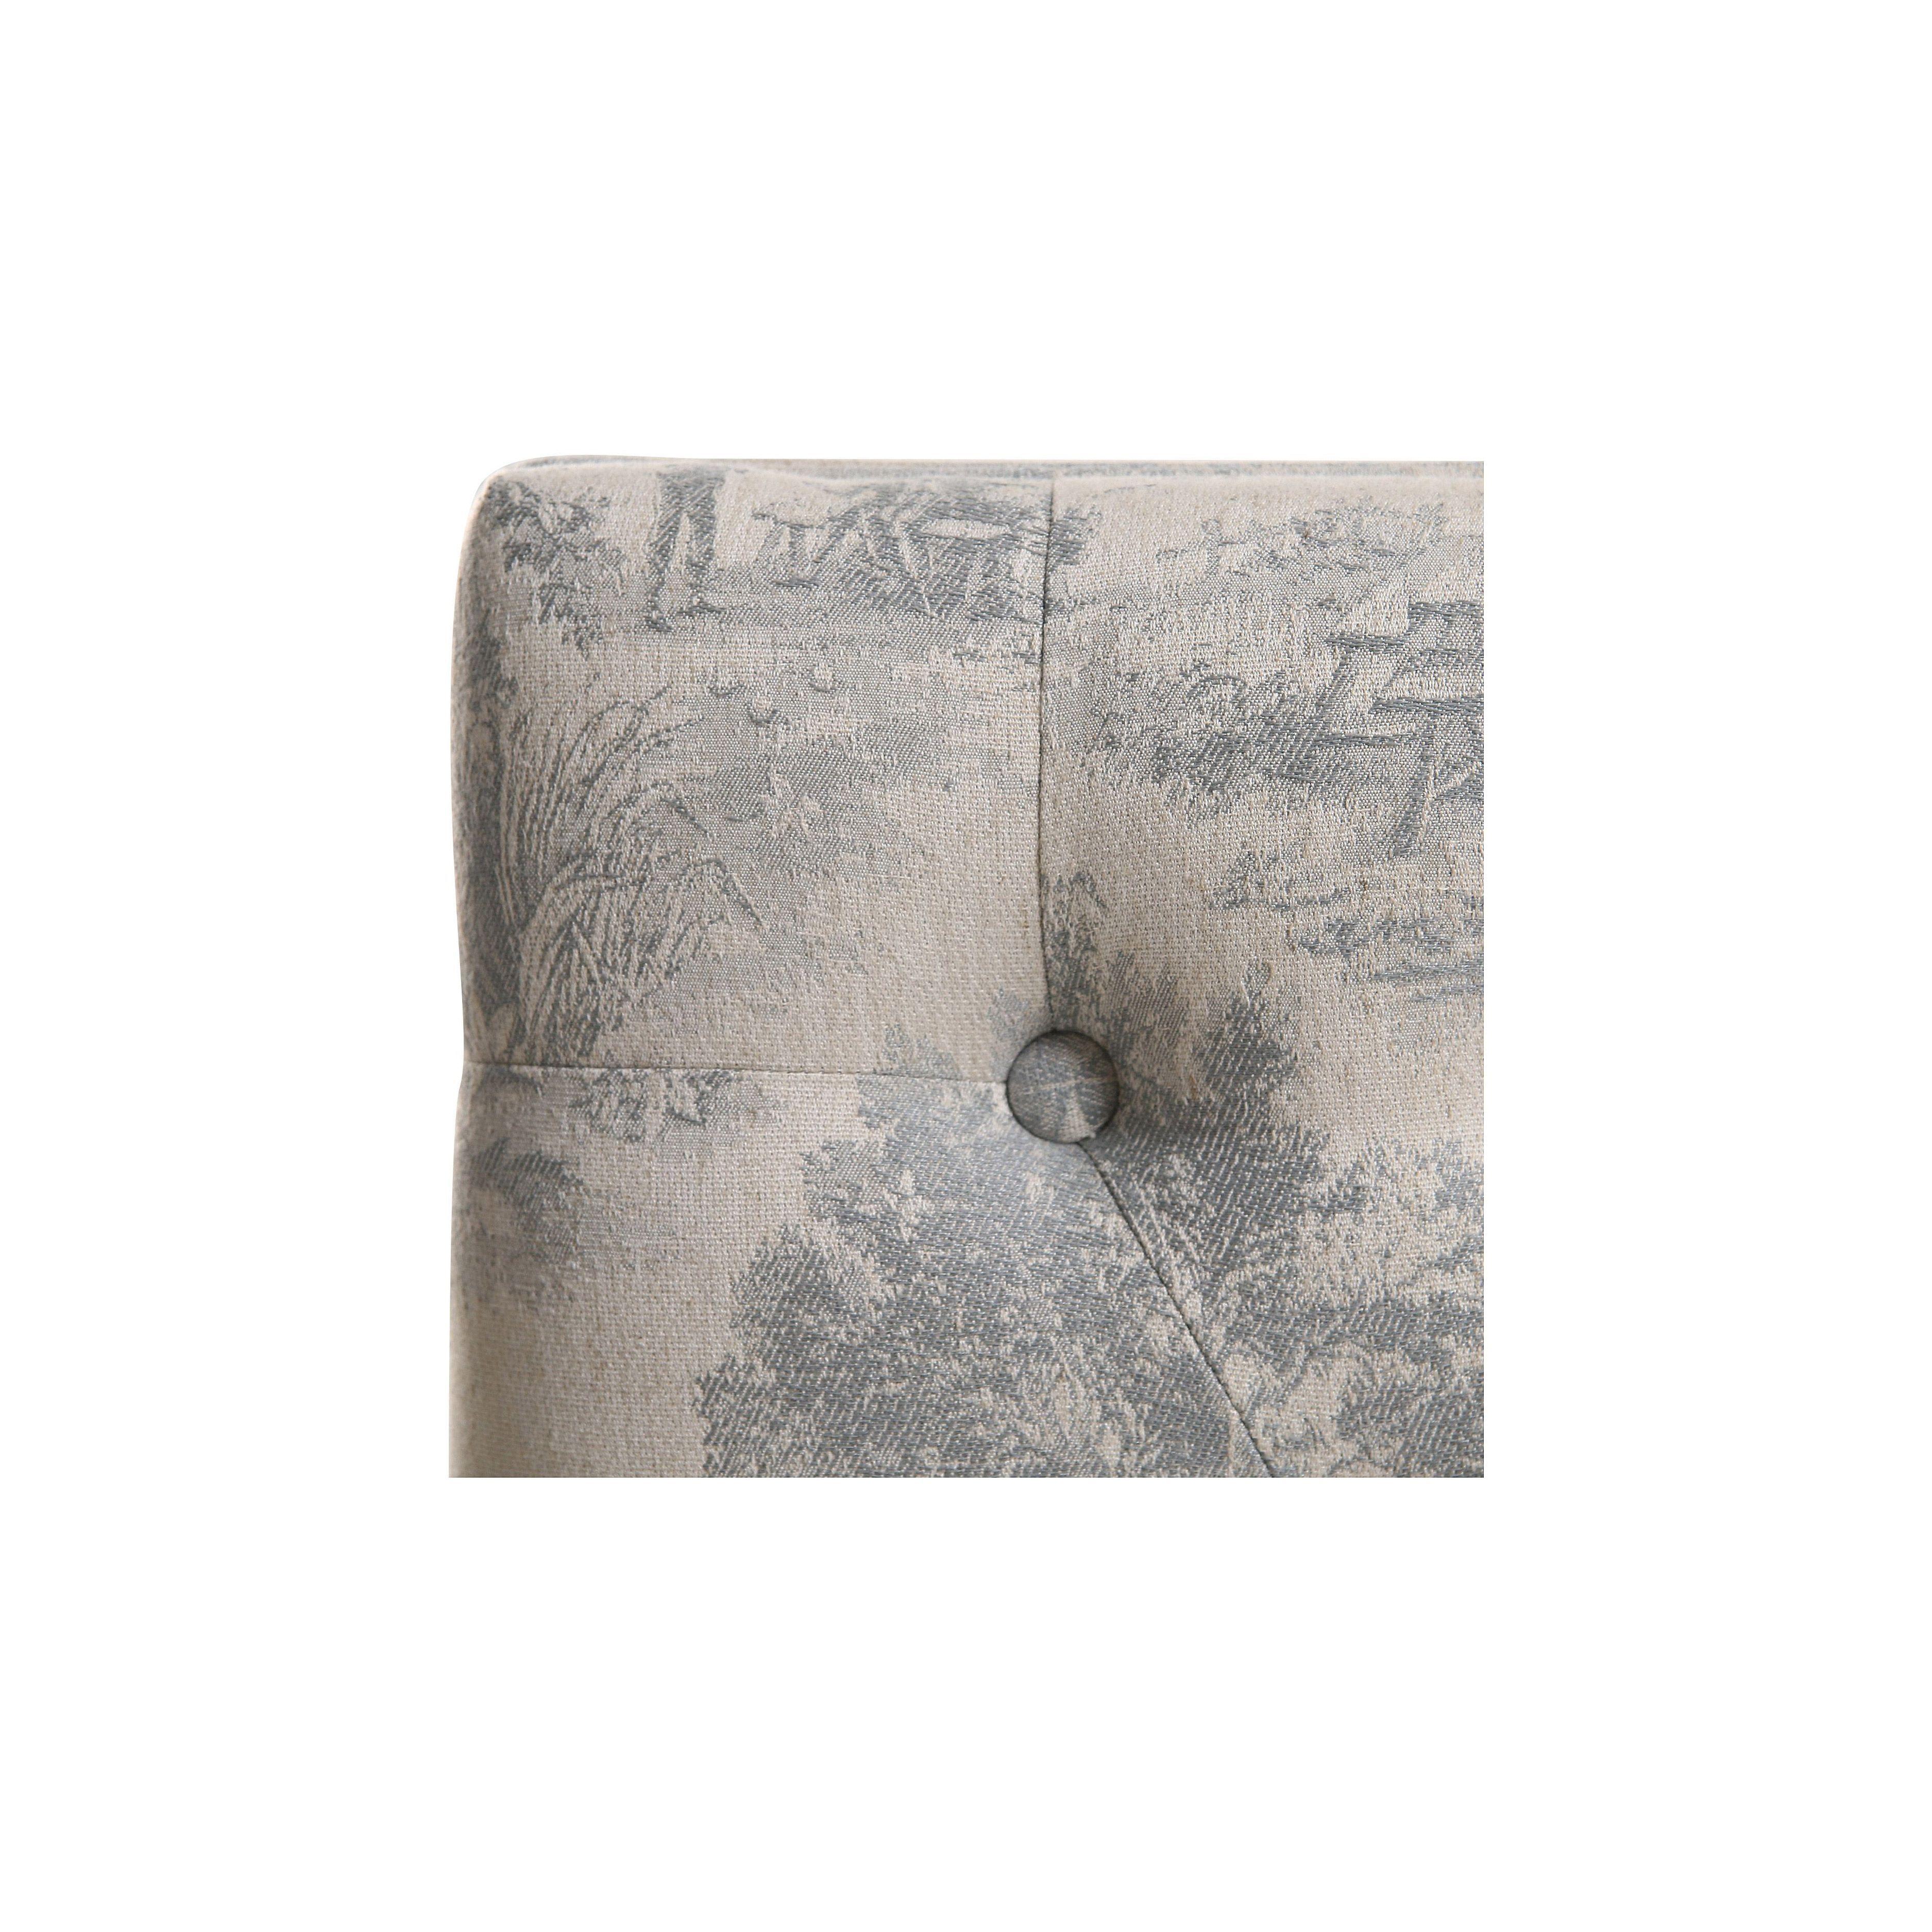 Banc ottoman en hévéa tissu toile de Jouy - Gaspard